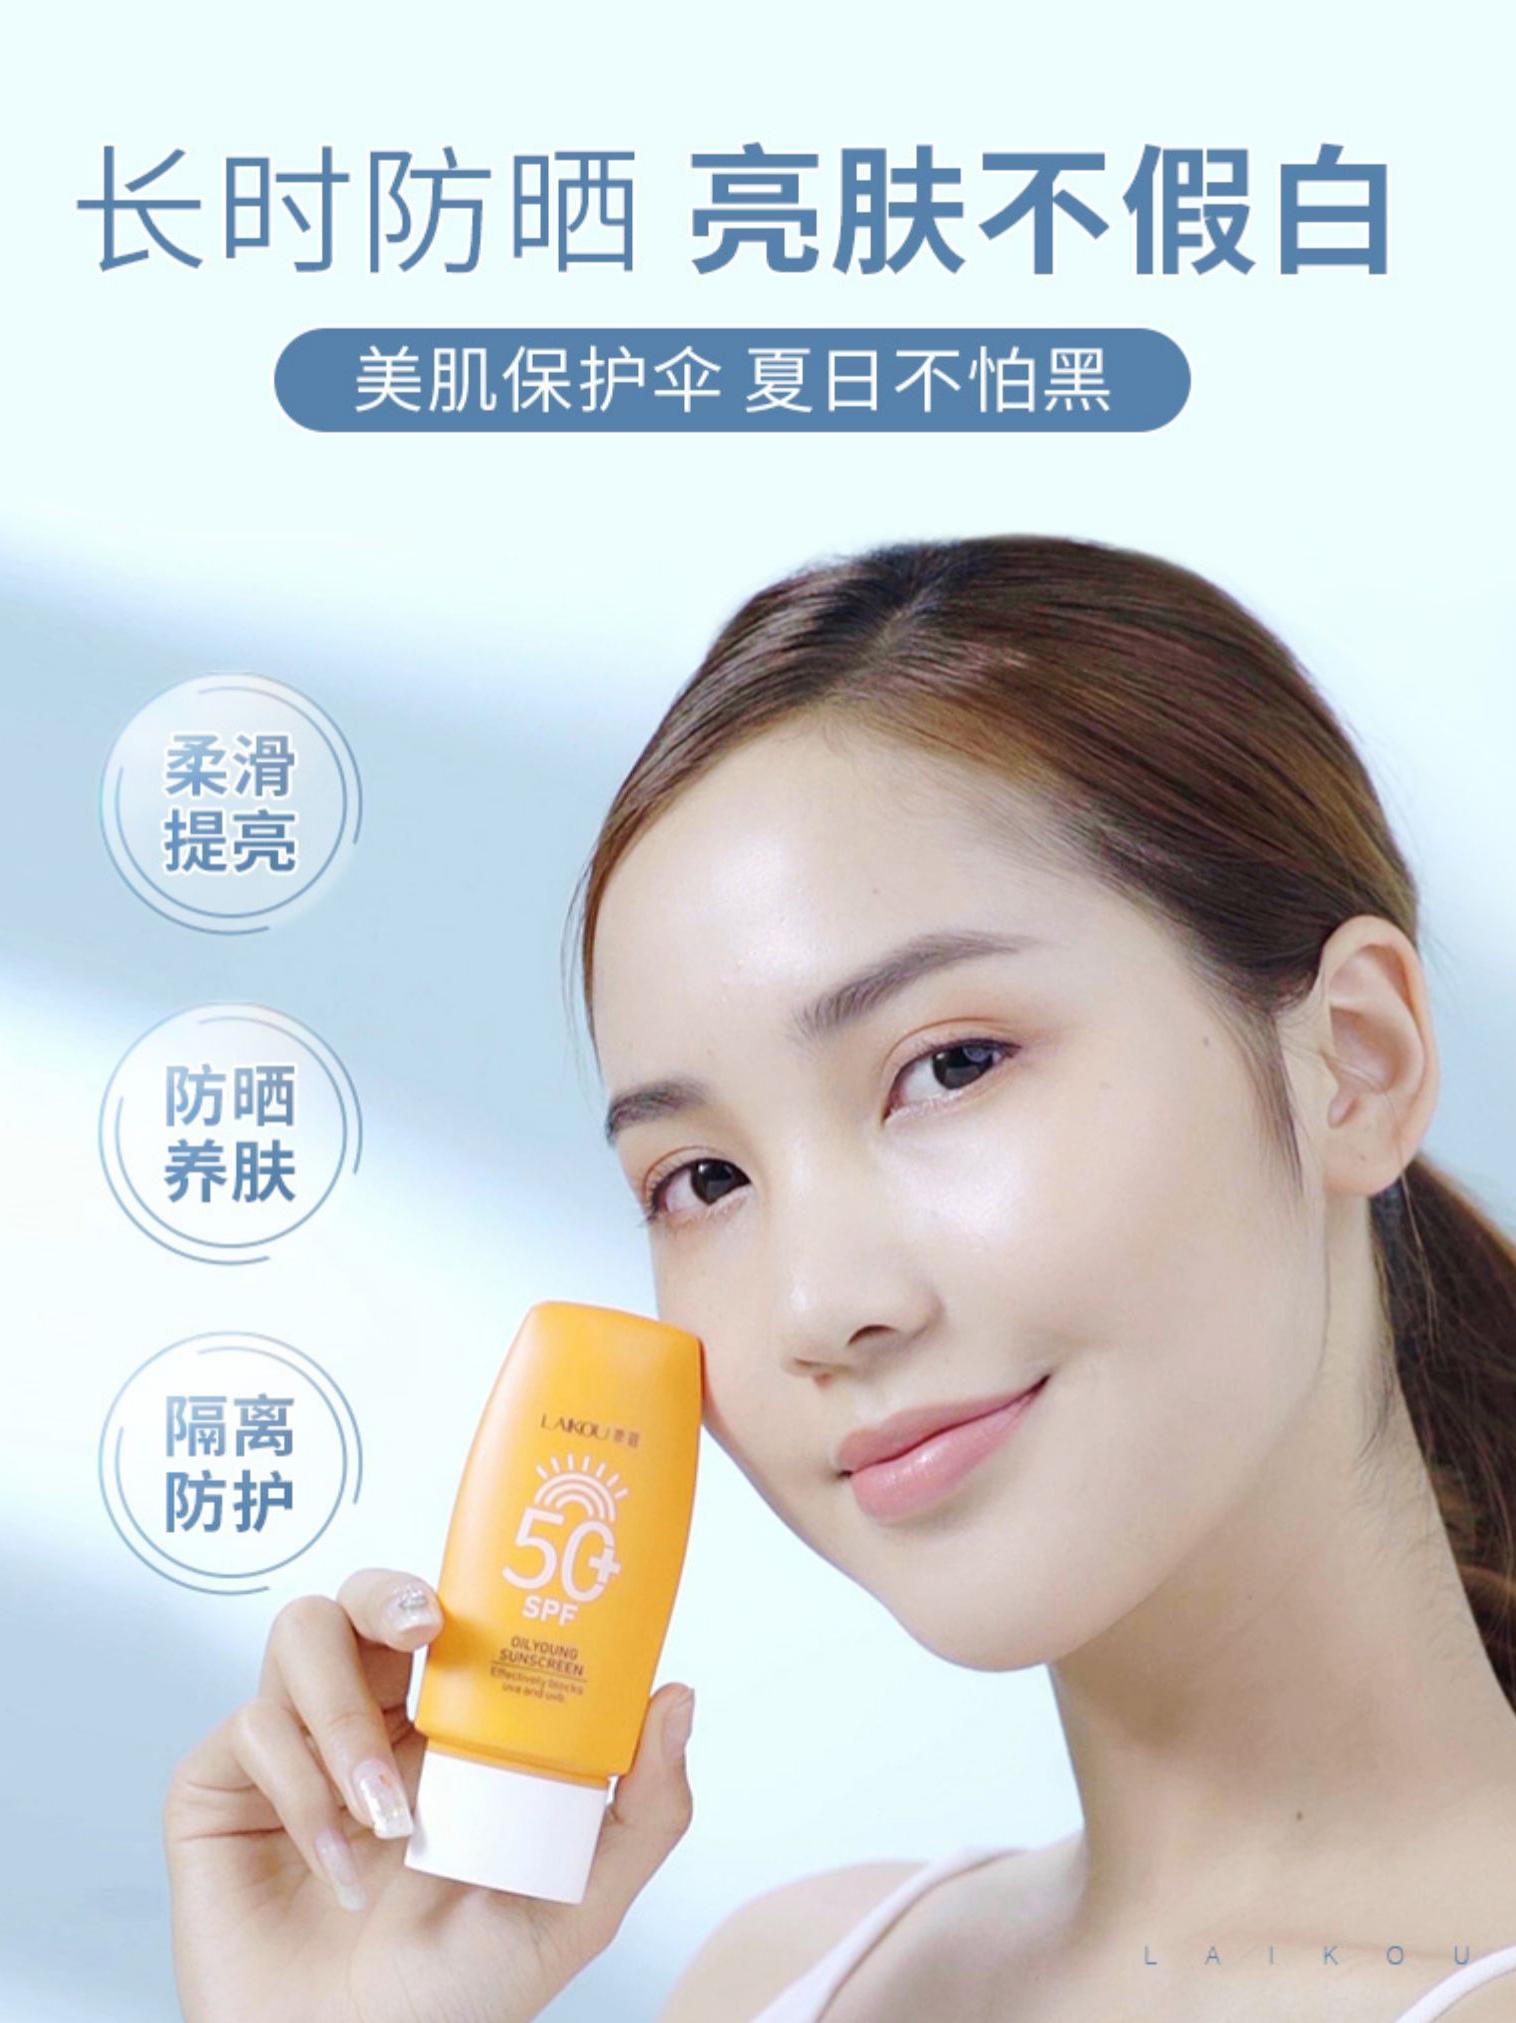 Laiwu sunscreen cream cream, non spray facial whole body student military training outdoor waterproof UV men and women